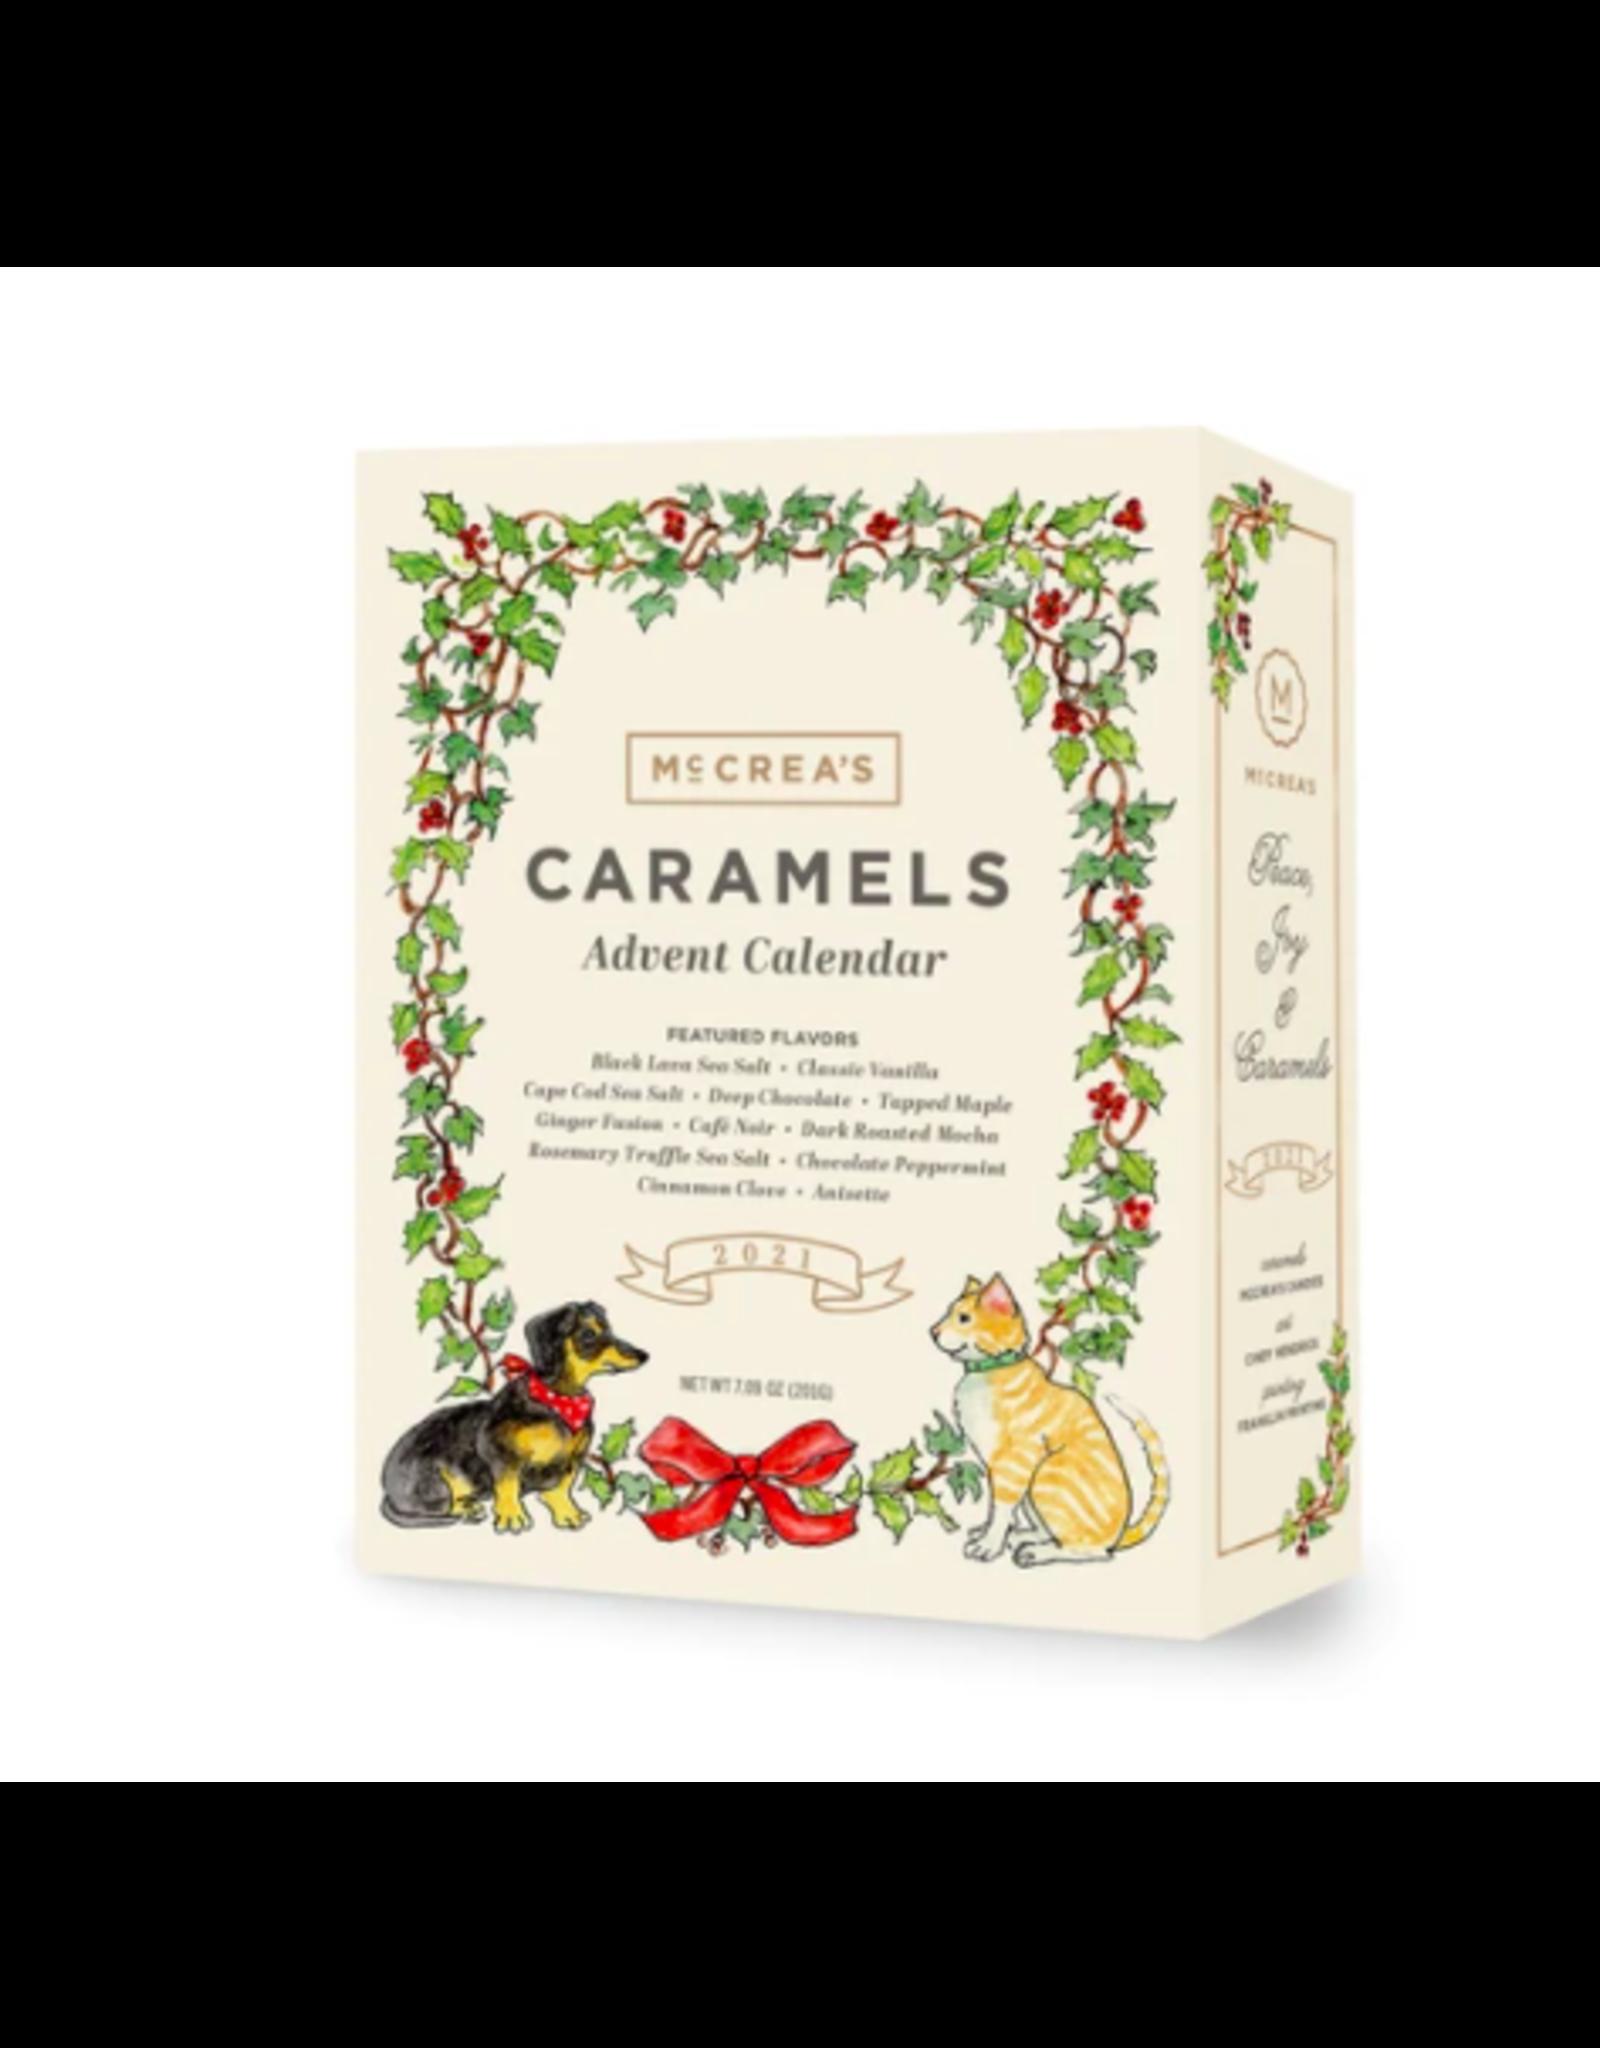 McCrea's 2021 Advent Calender of Caramels